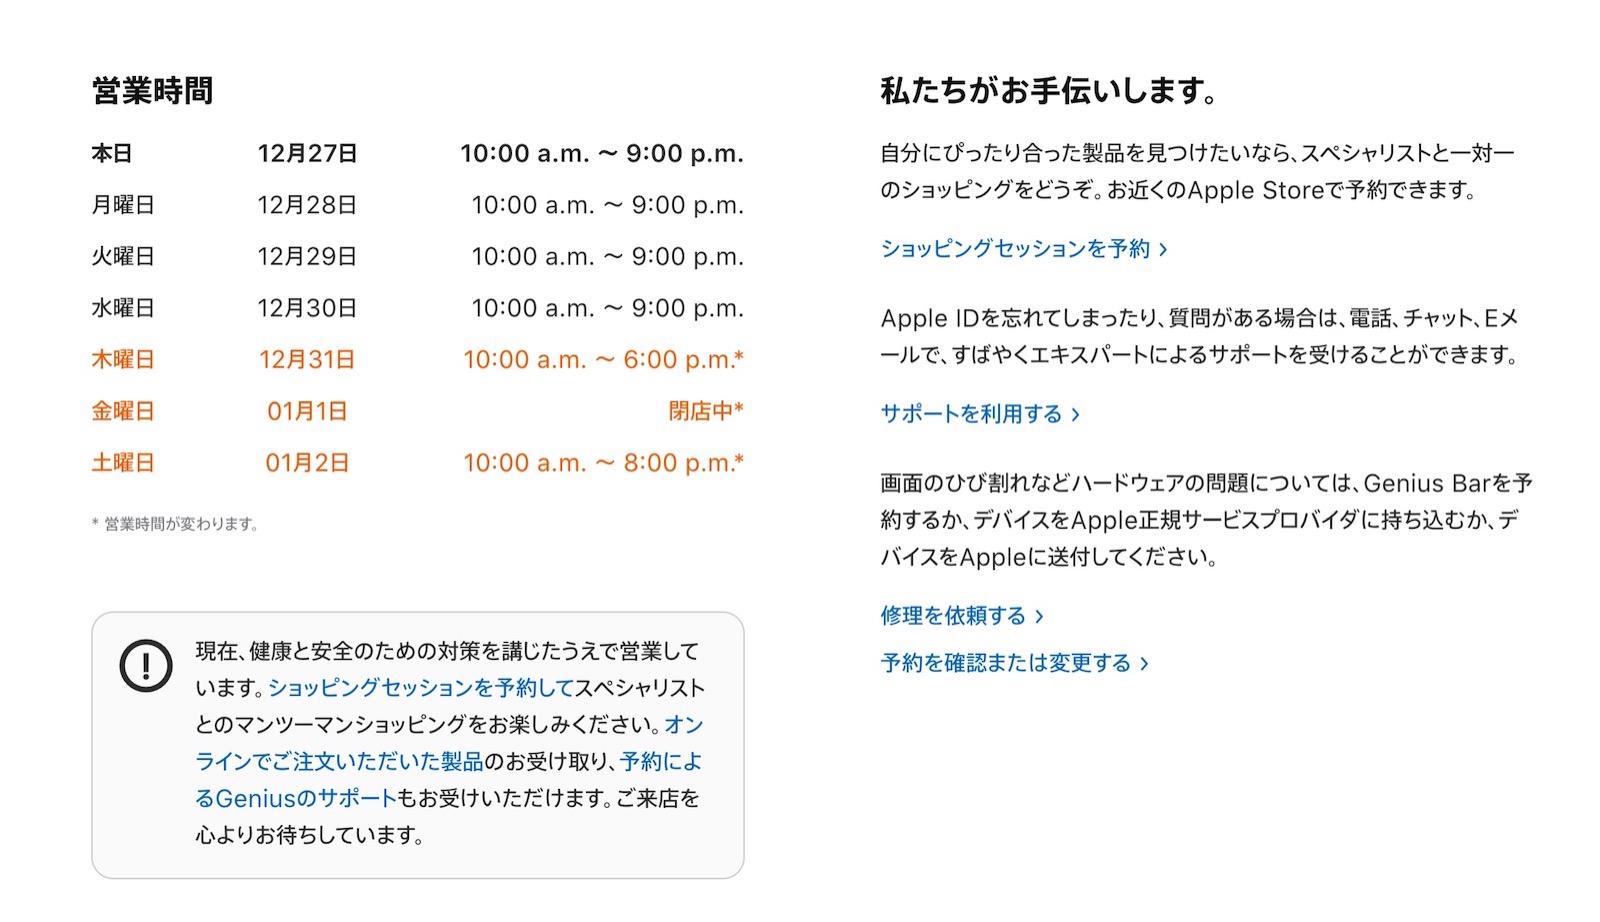 Apple store marunouchi 2020 2021 open hours